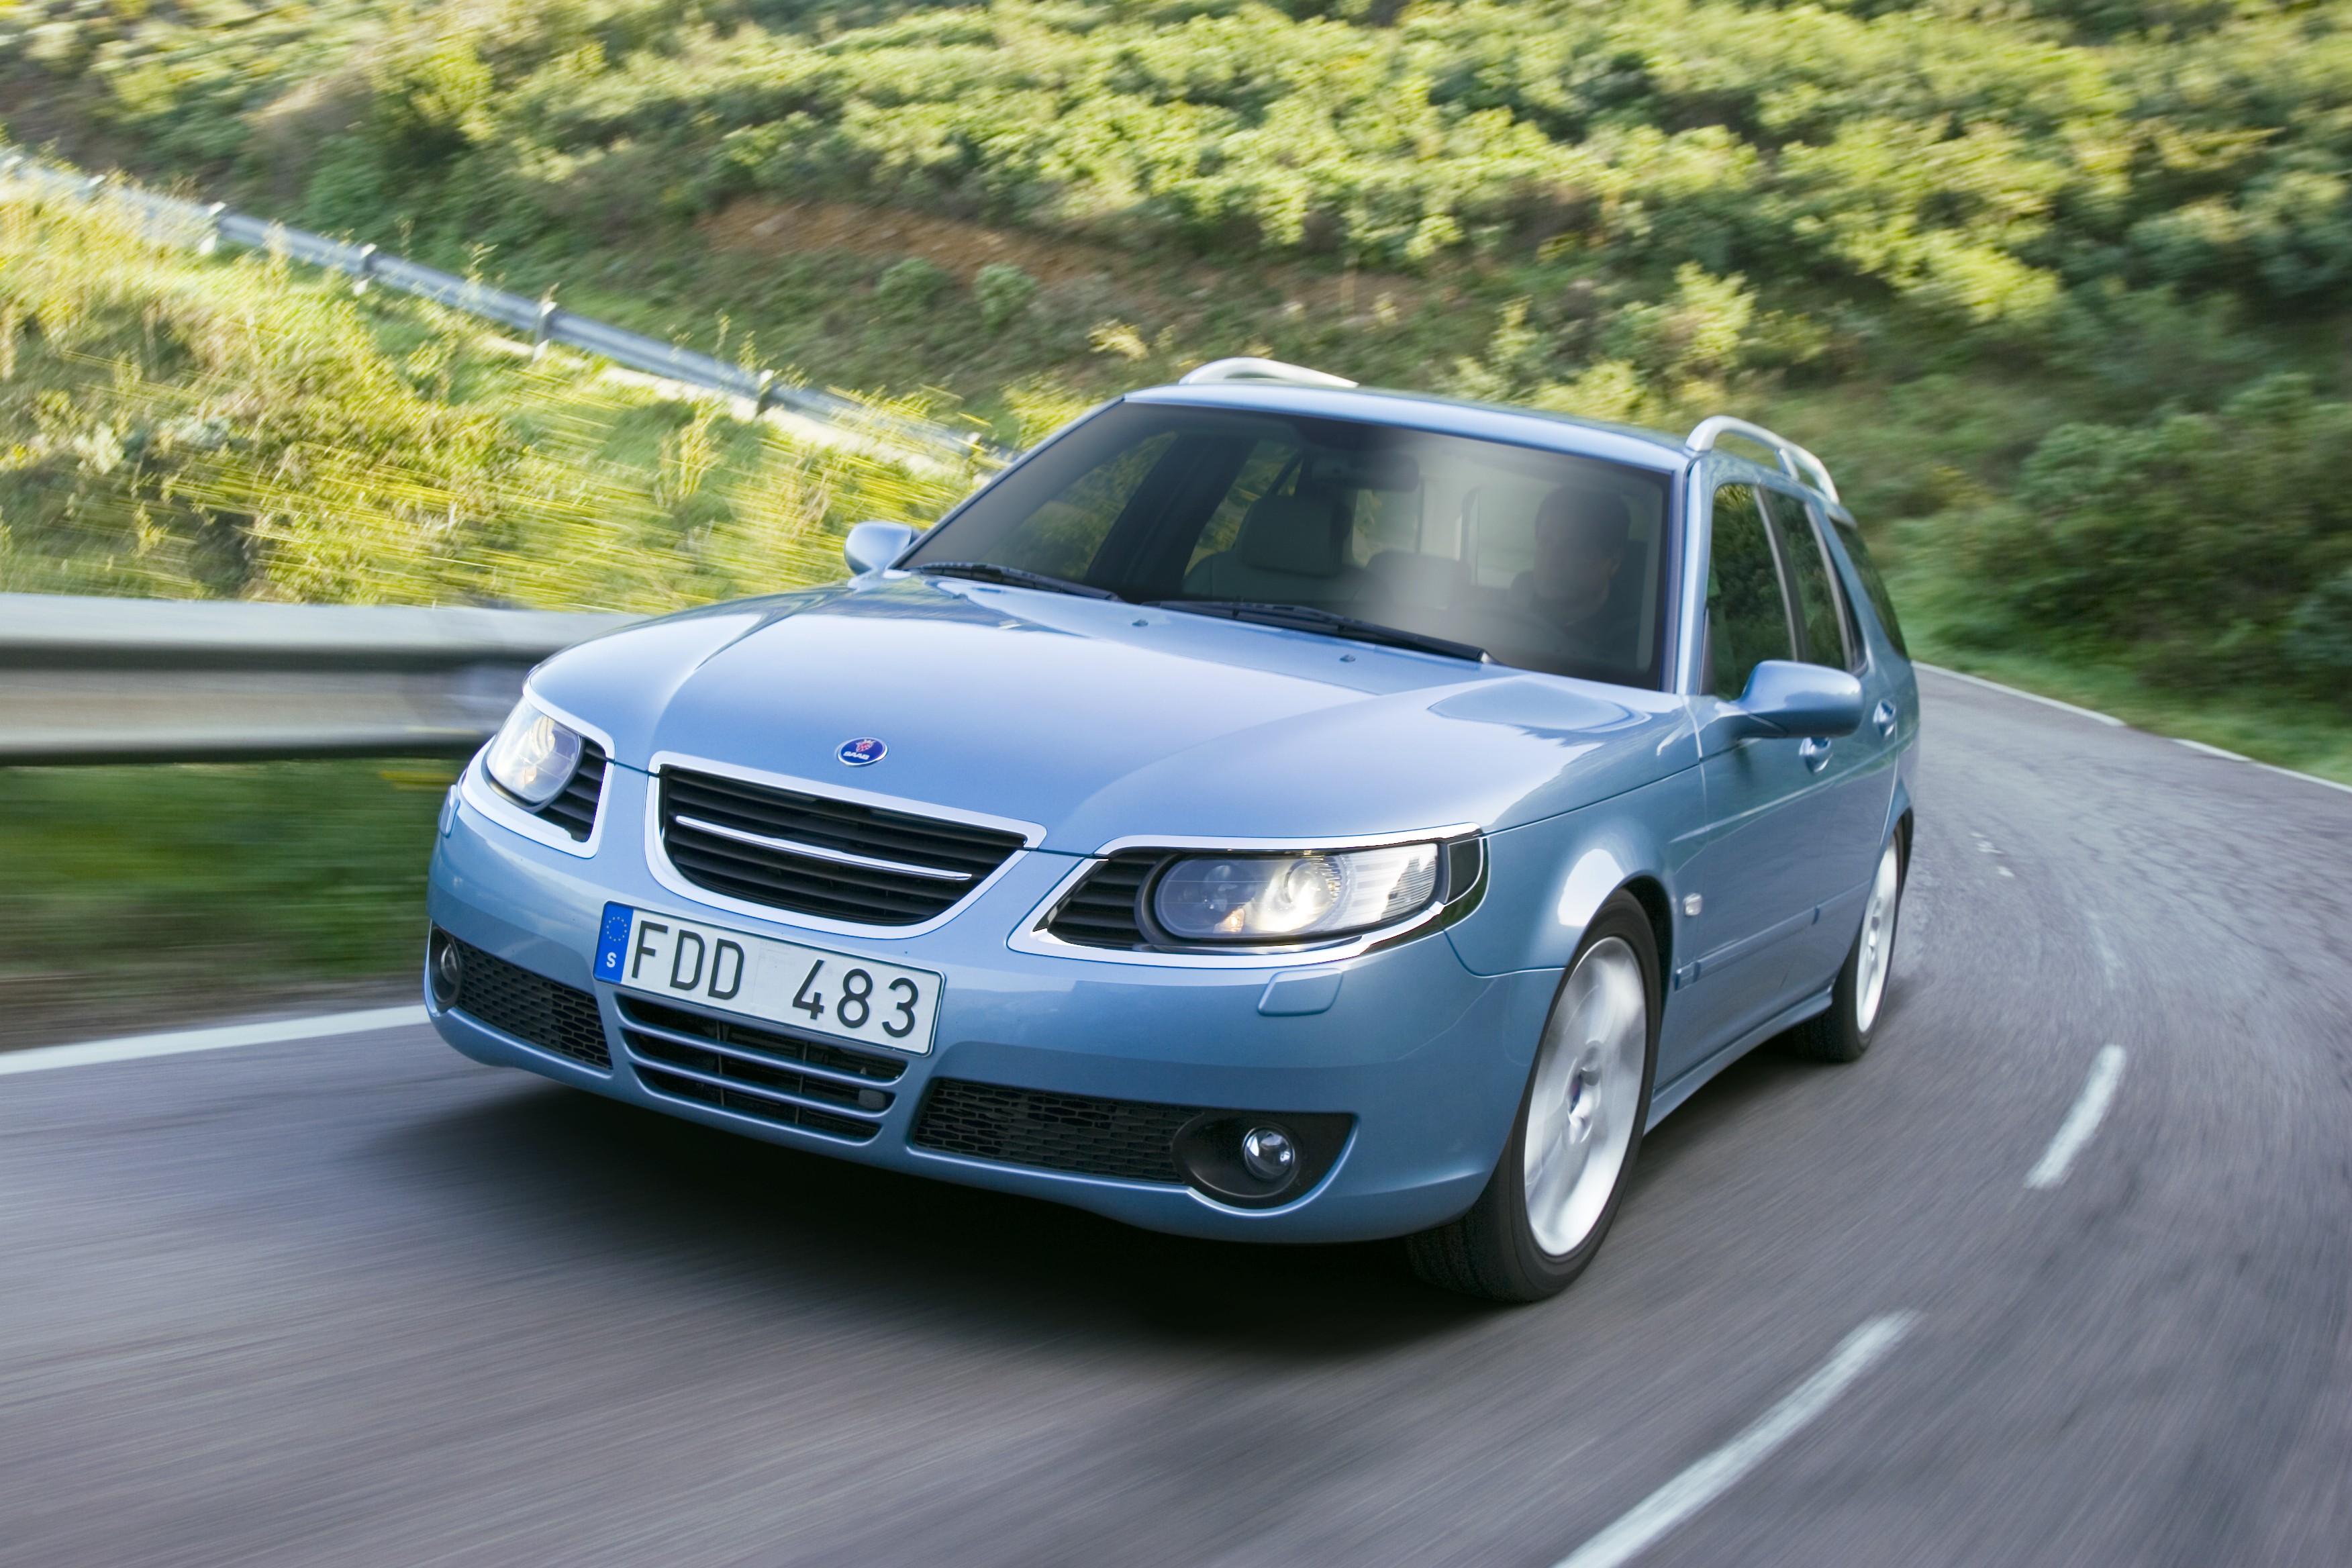 2008 Saab 9 5 SportCombi Photo